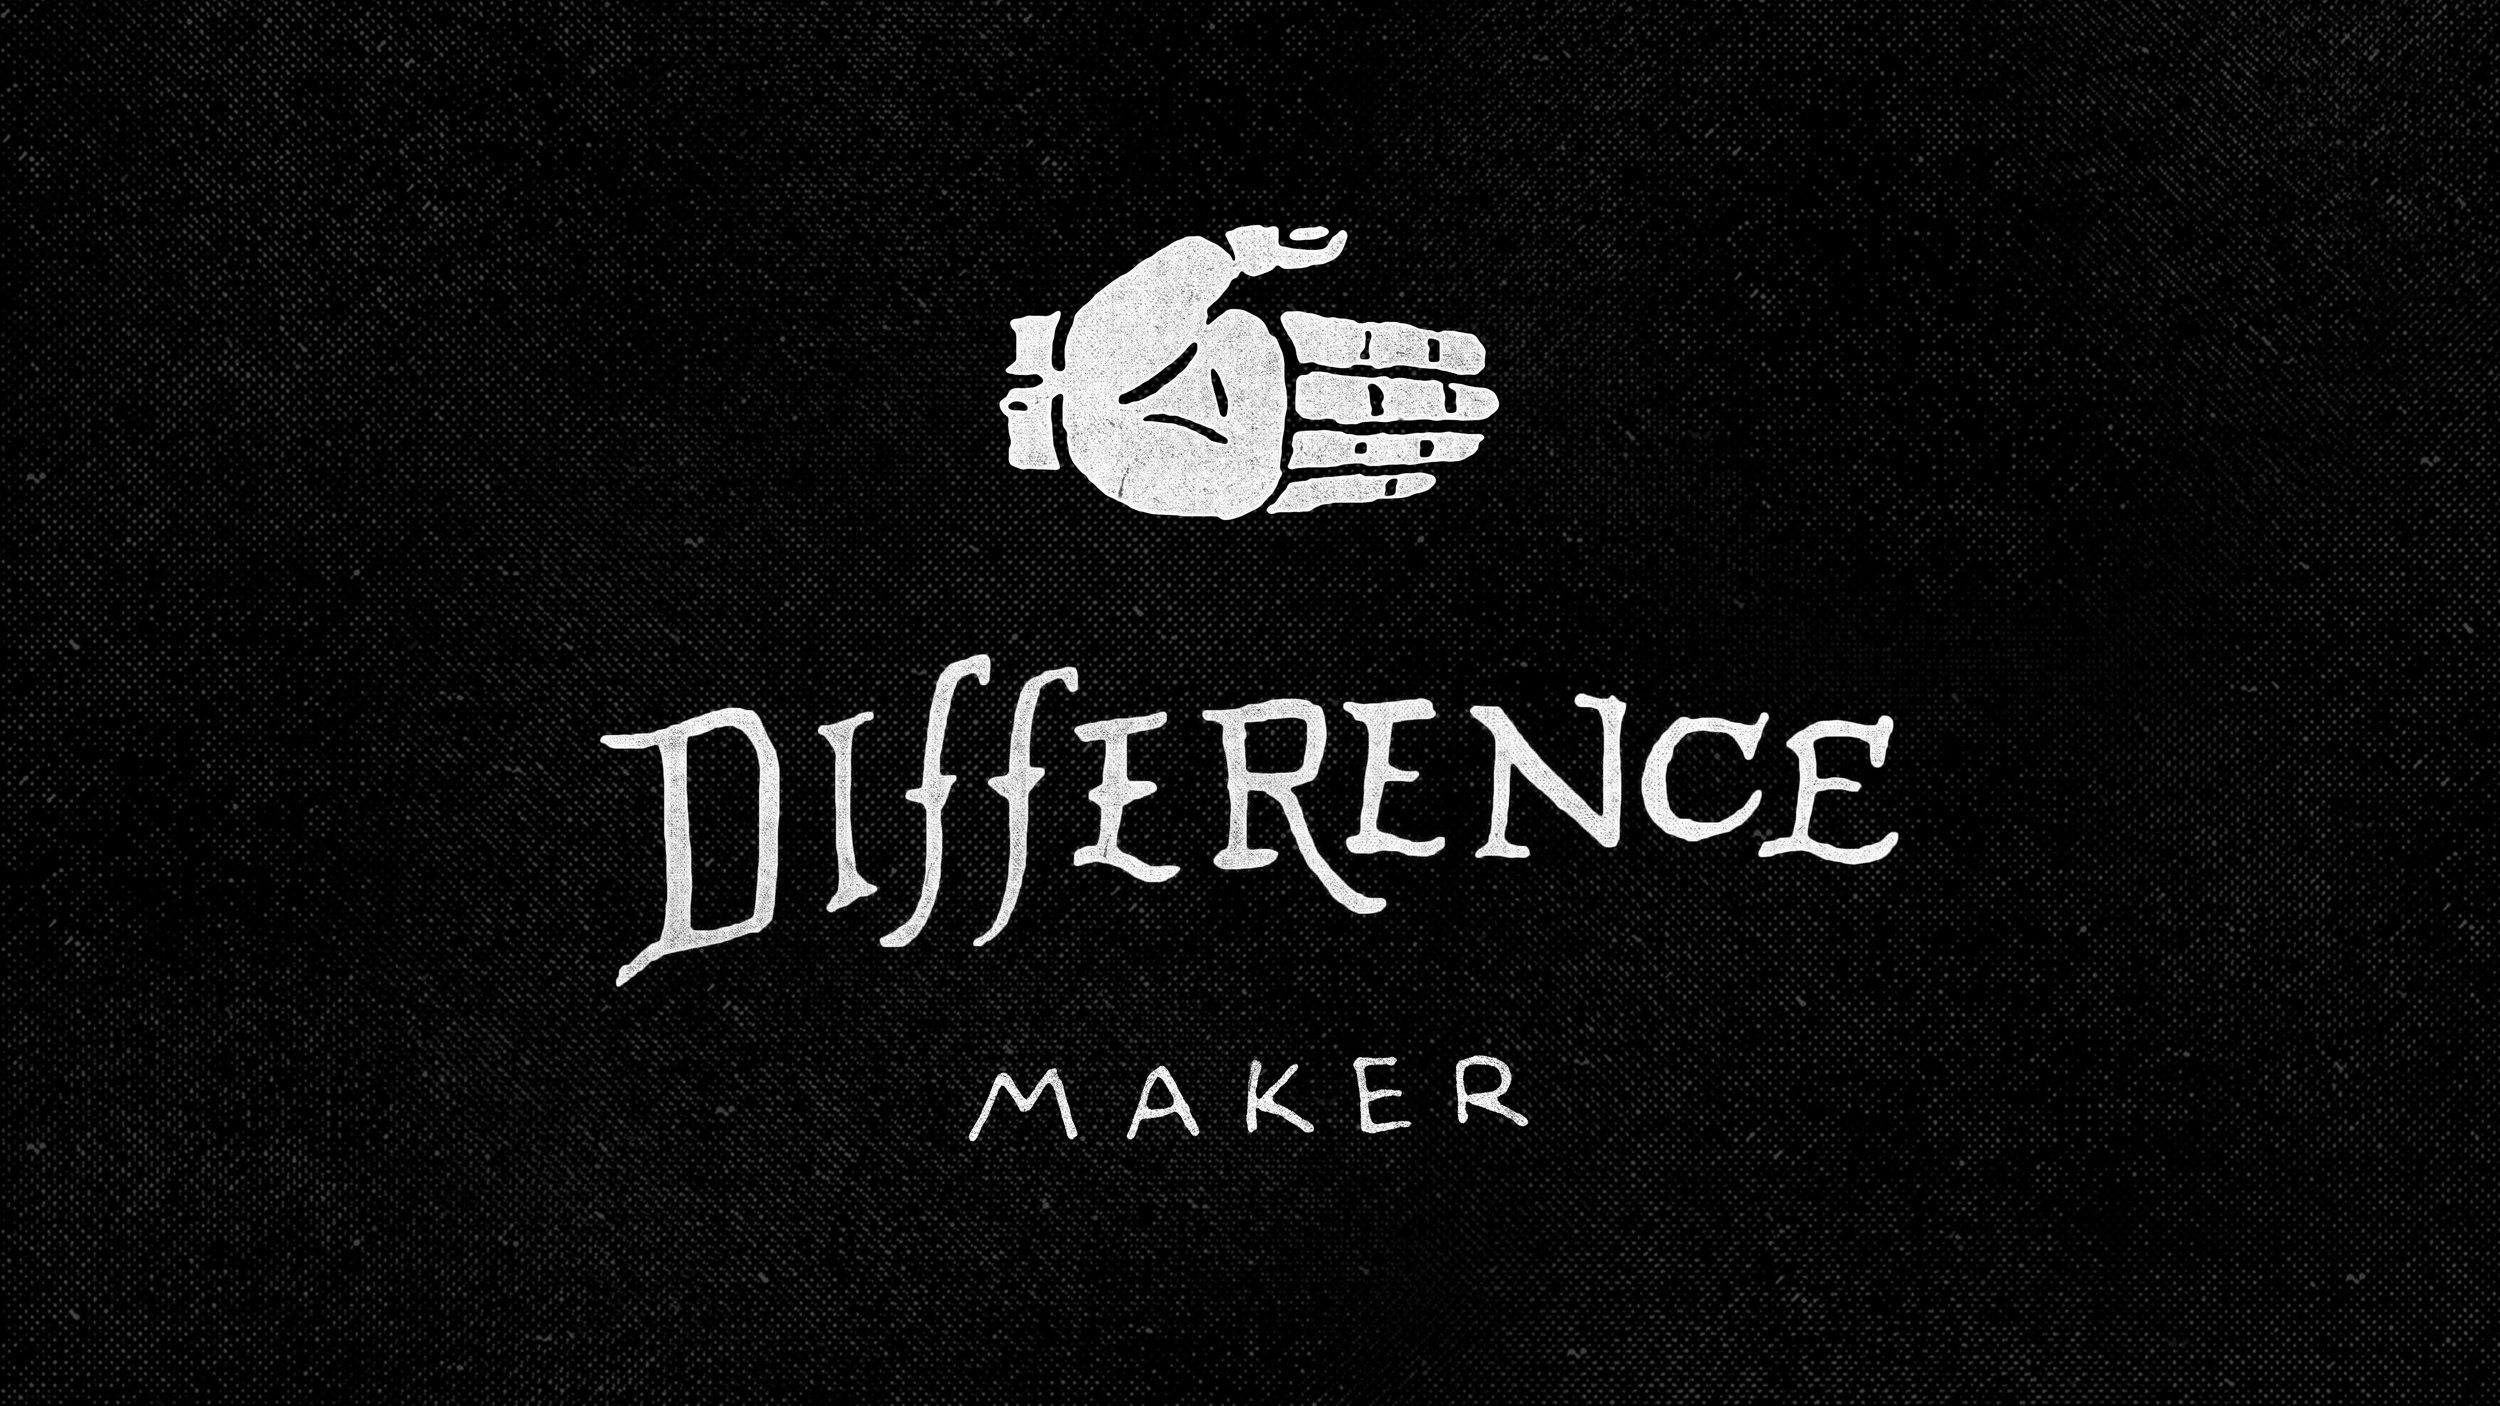 33319_Difference_Maker.jpg